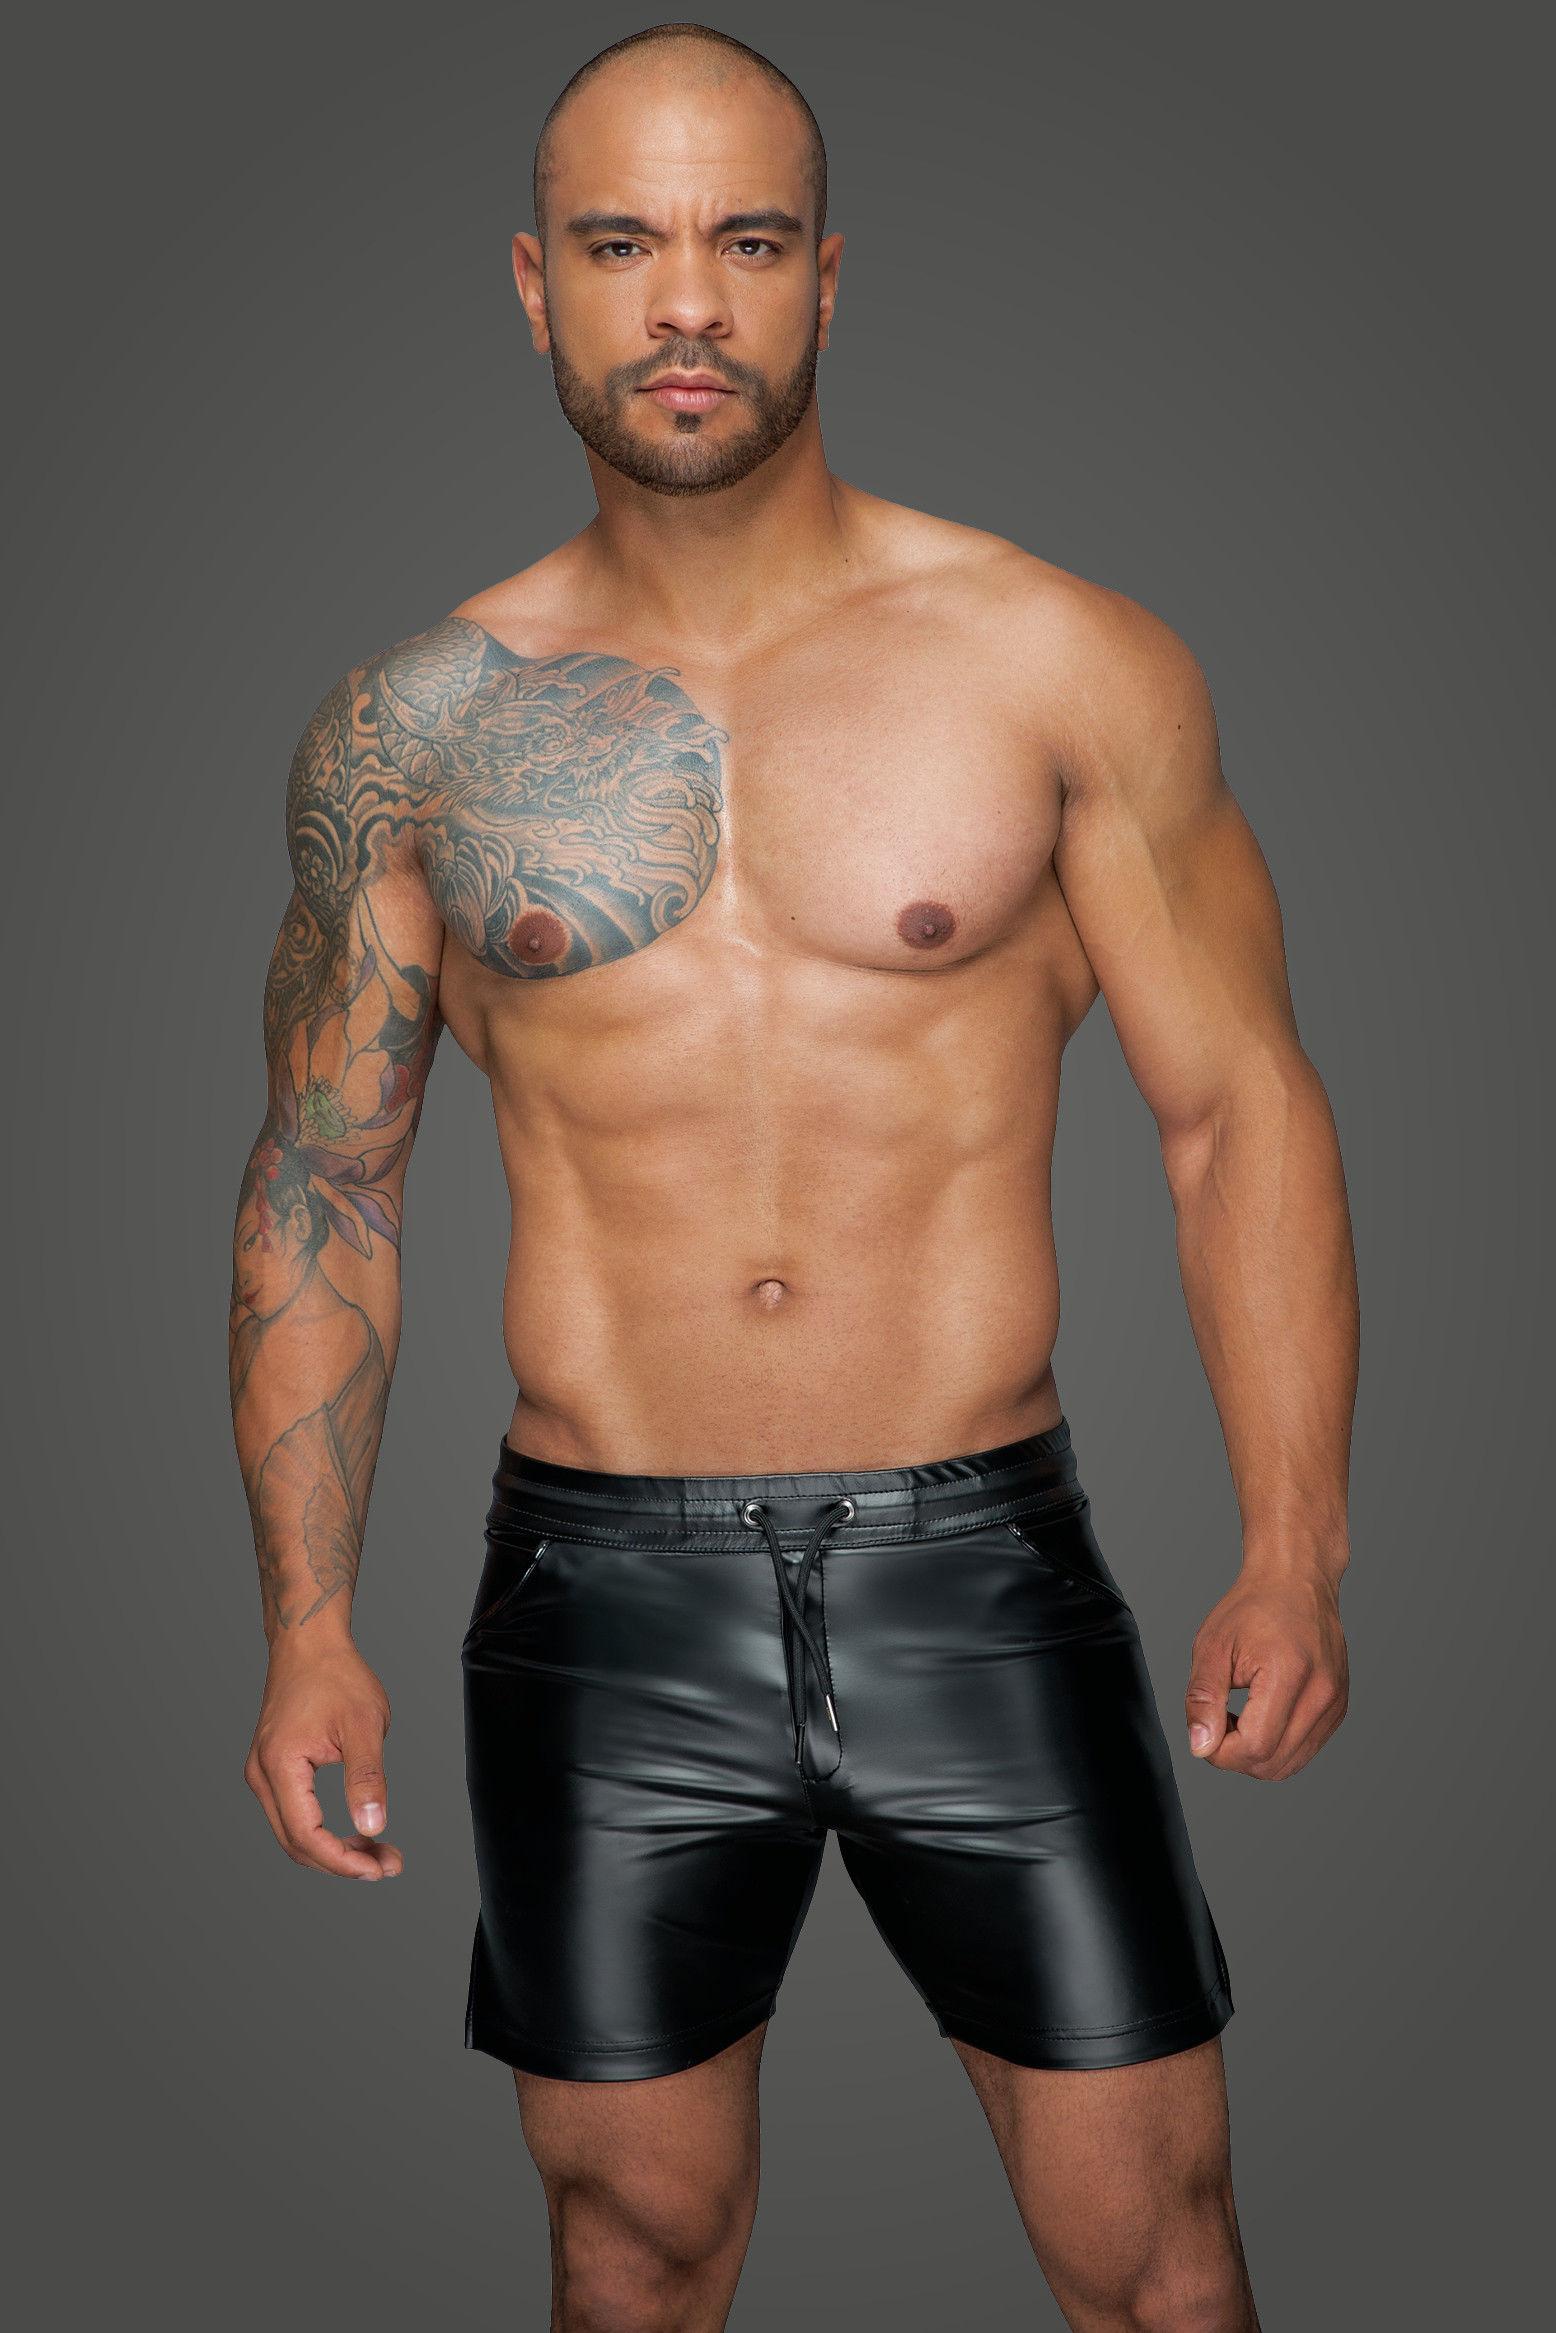 Noir Handmade H061 Powerwetlook Shorts in Comfortable Length M